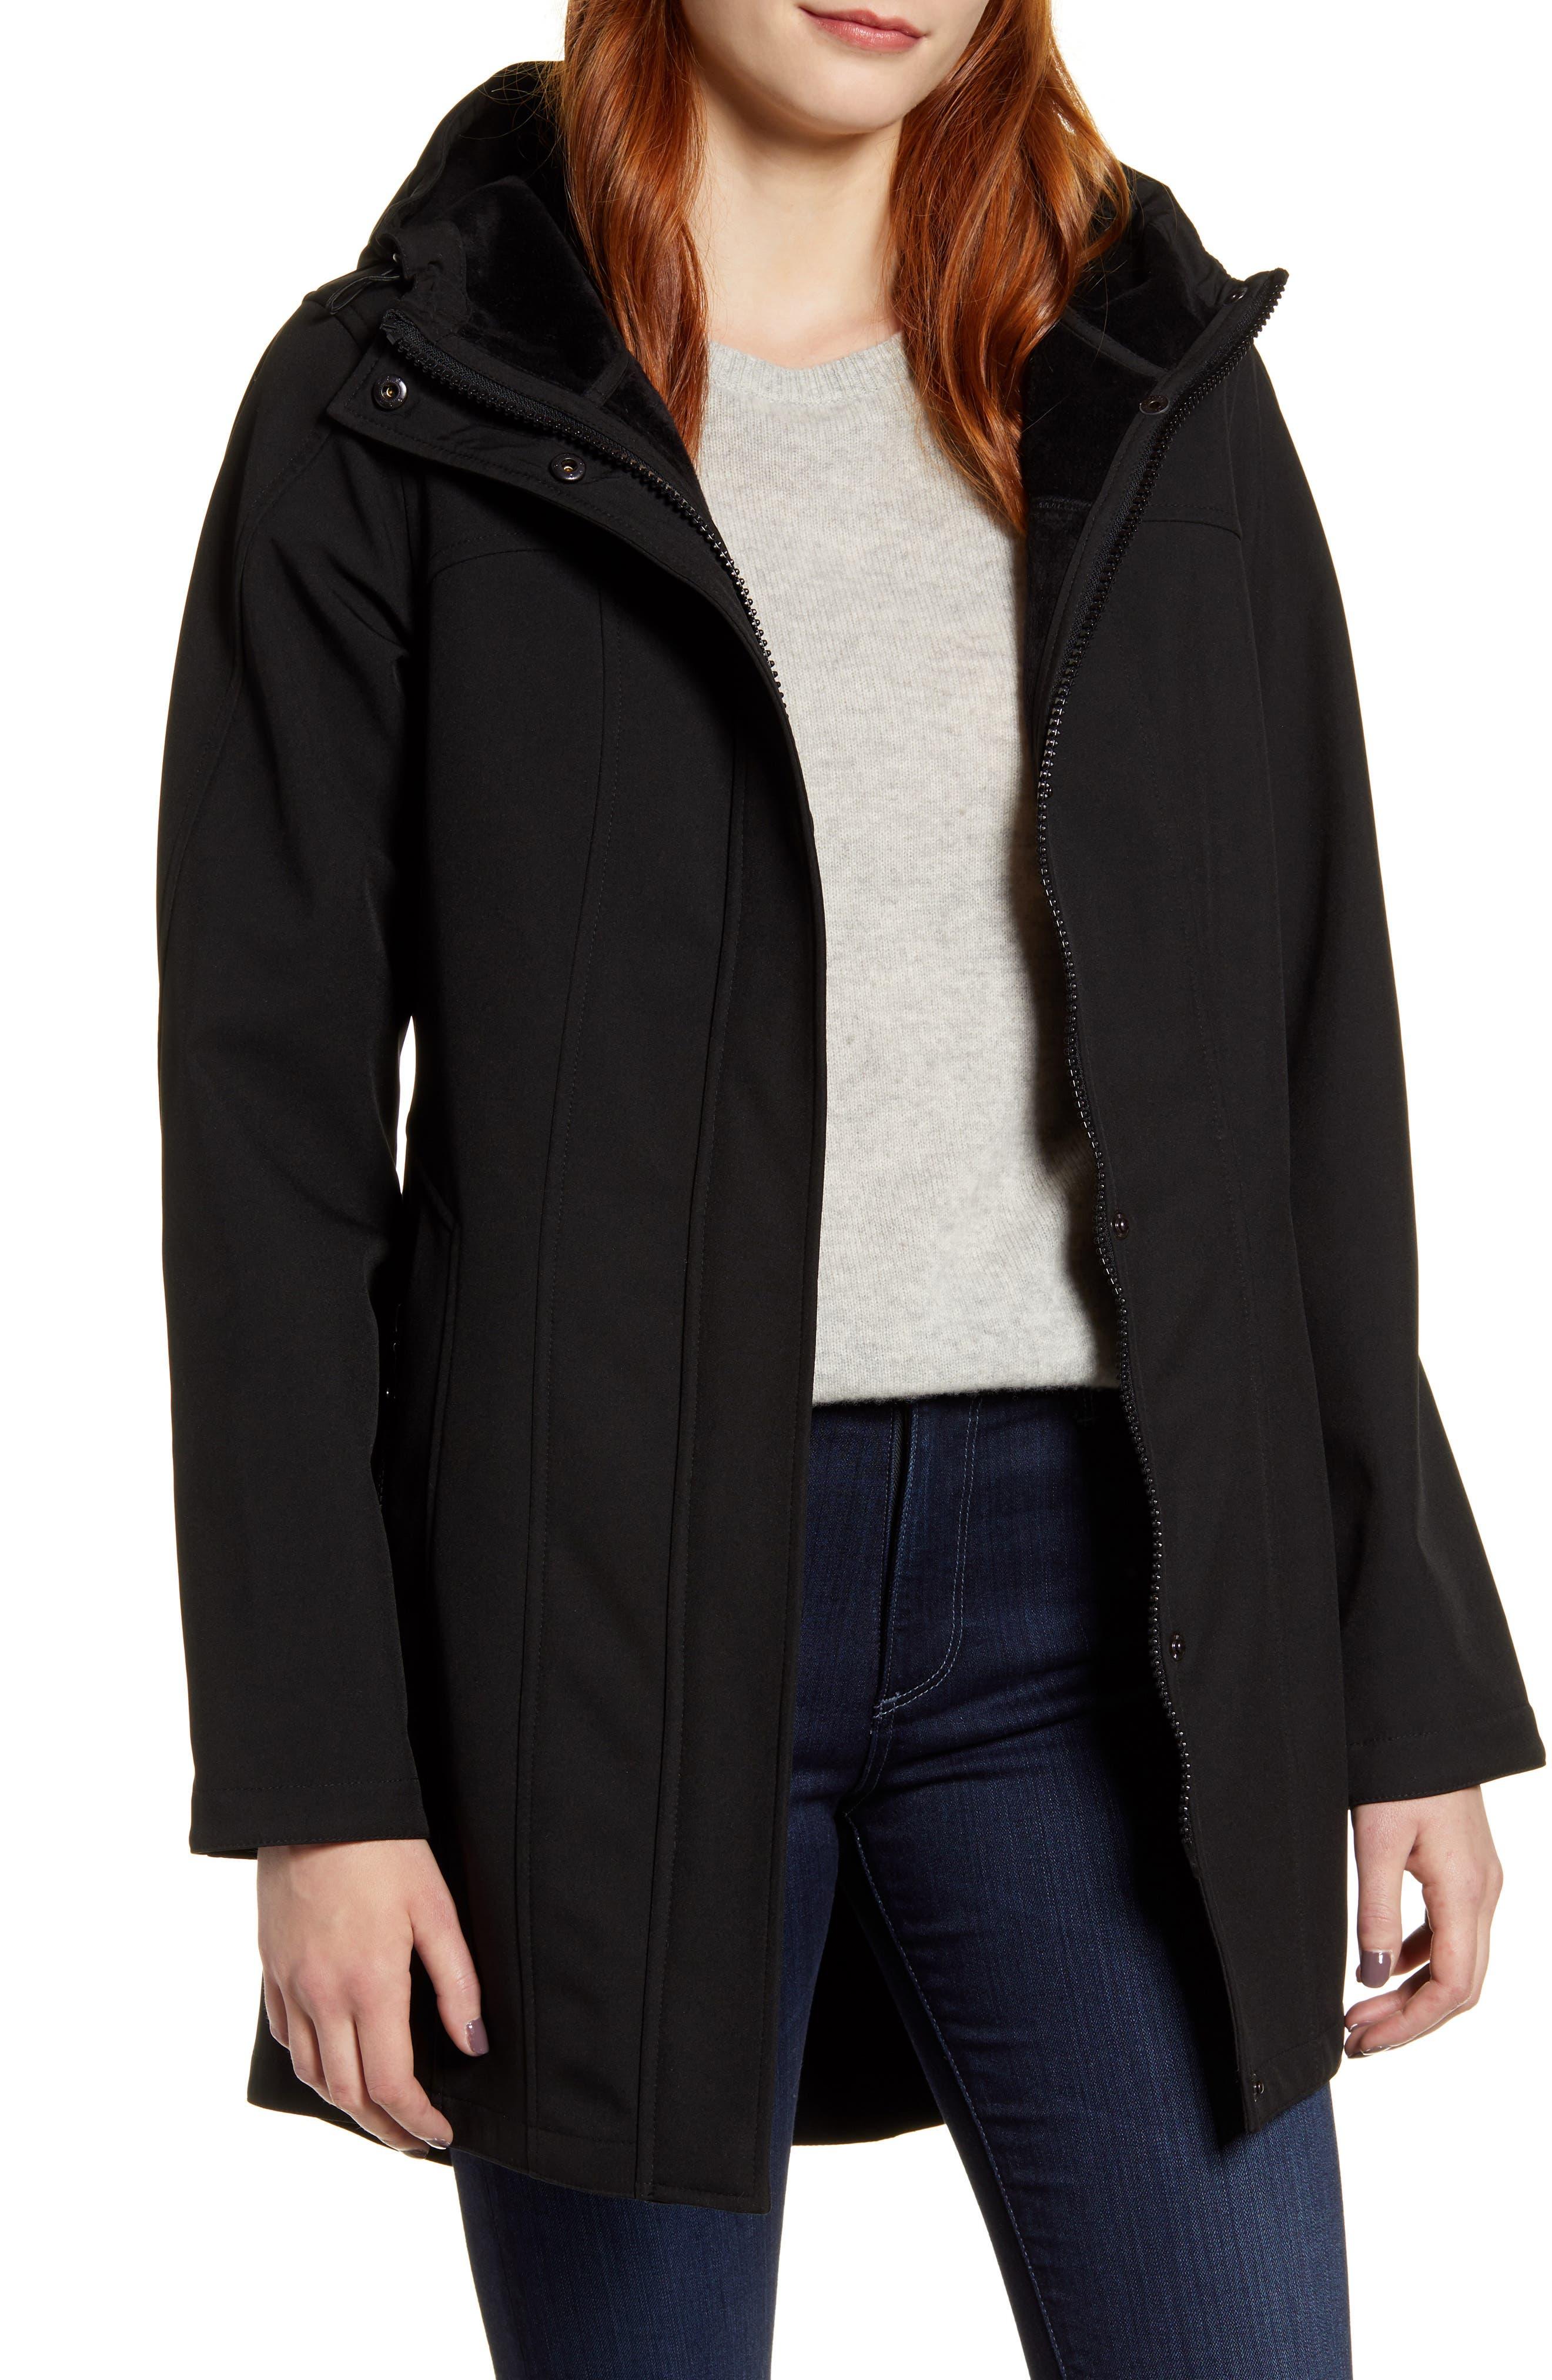 Kristen Blake Packable Softshell Hooded Jacket